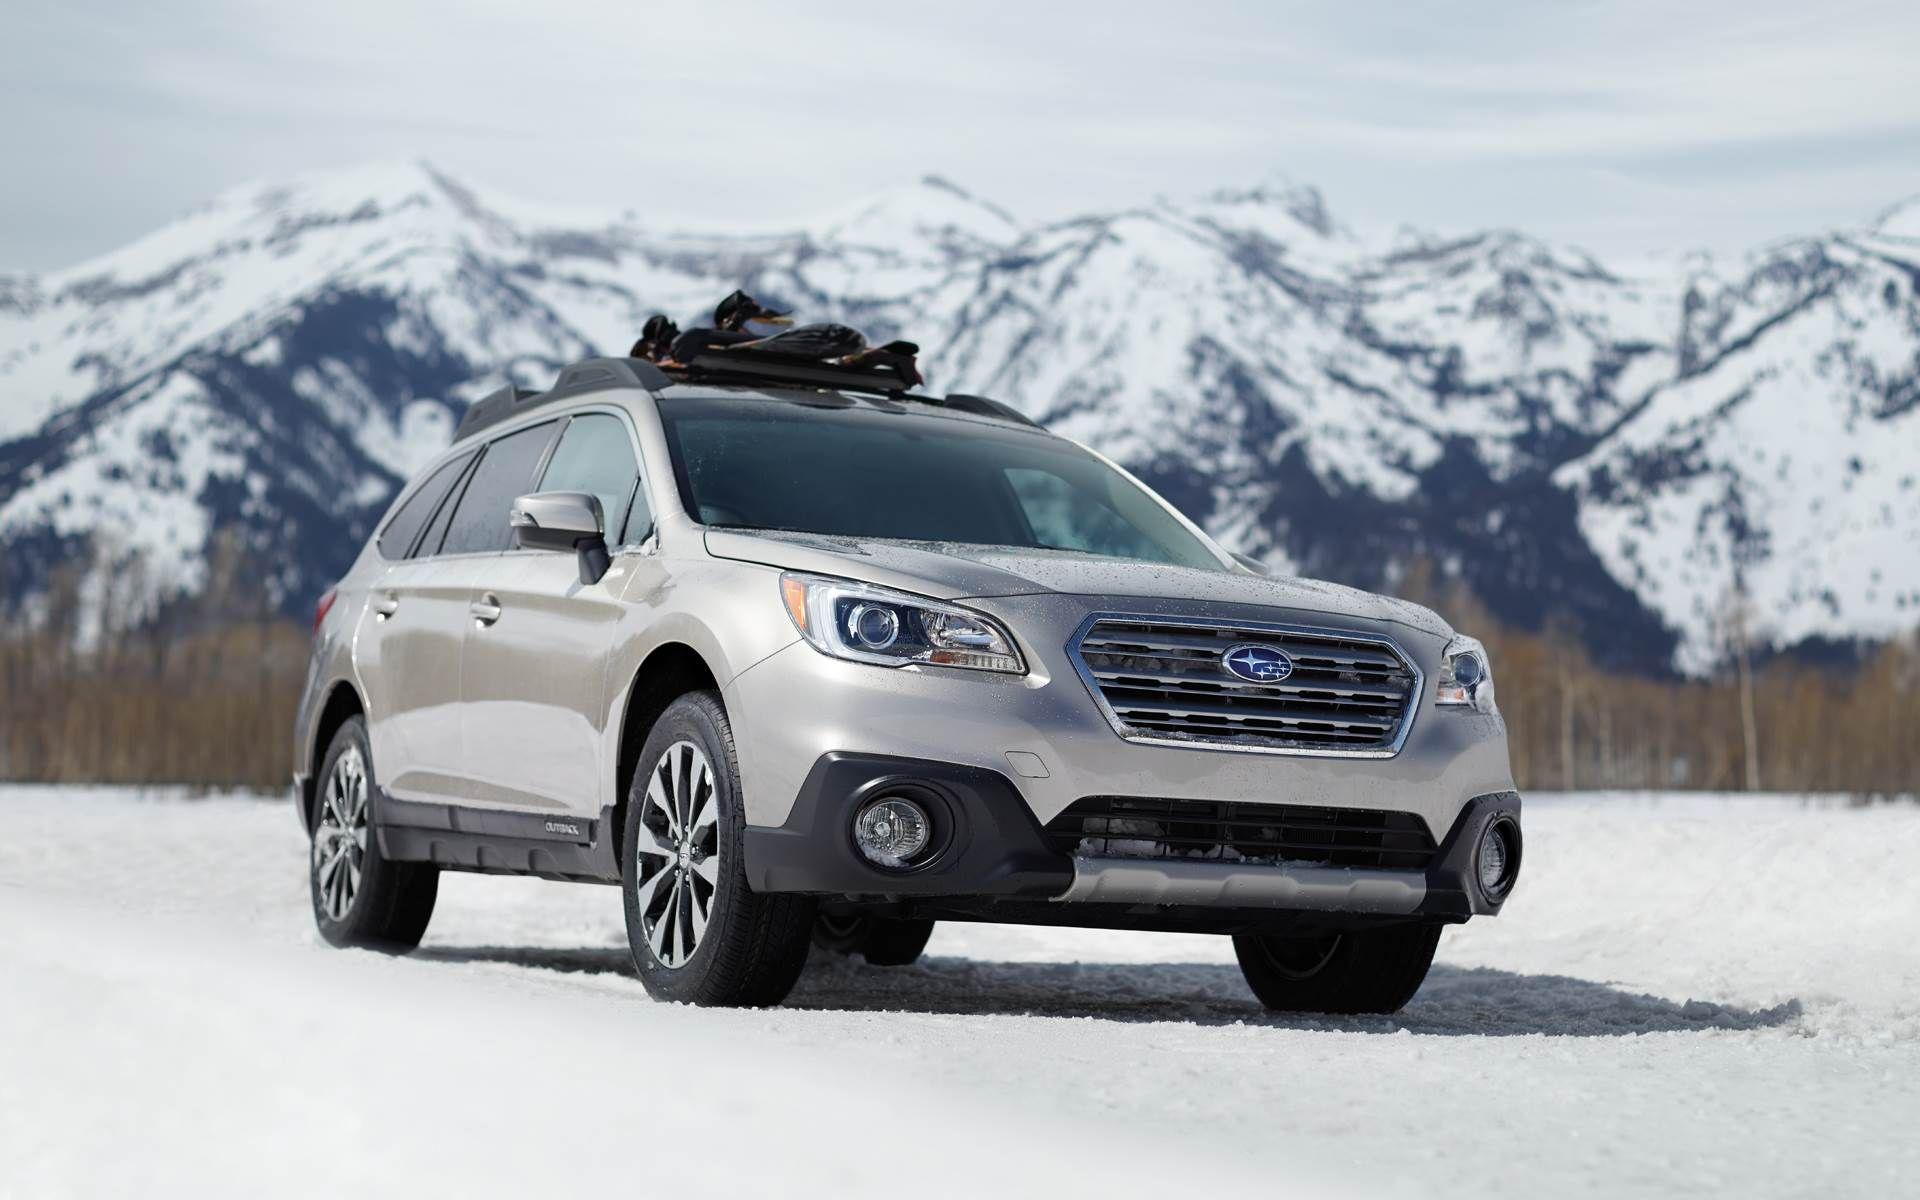 2018 subaru ascent suv price interior release date and specs rumors car rumor subaru pinterest suv prices subaru and wheels